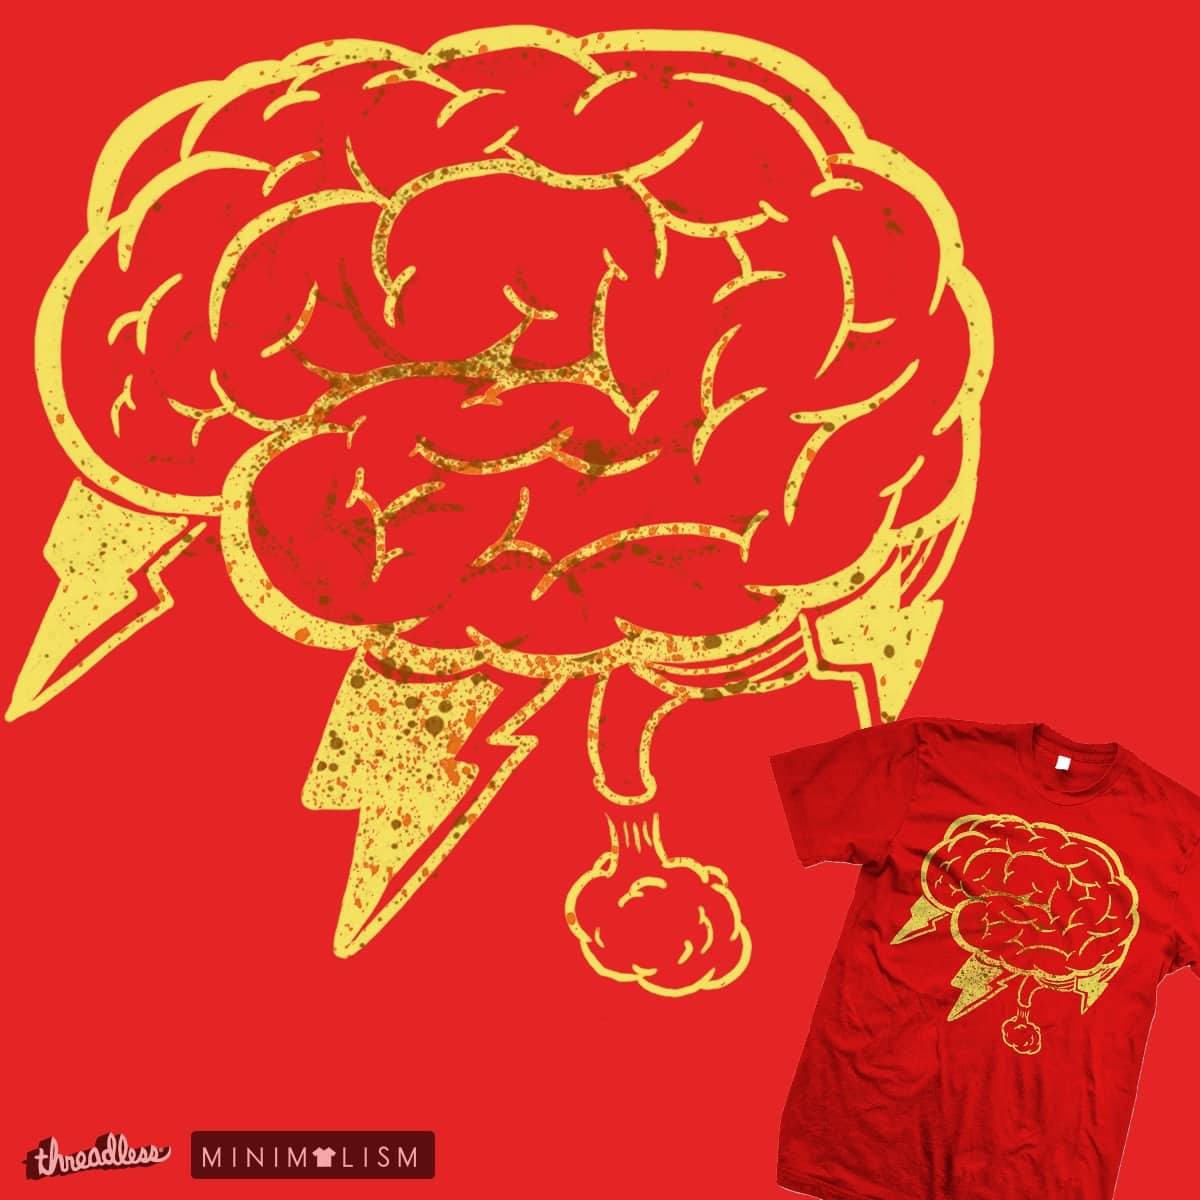 Brain Fart by Noamos on Threadless